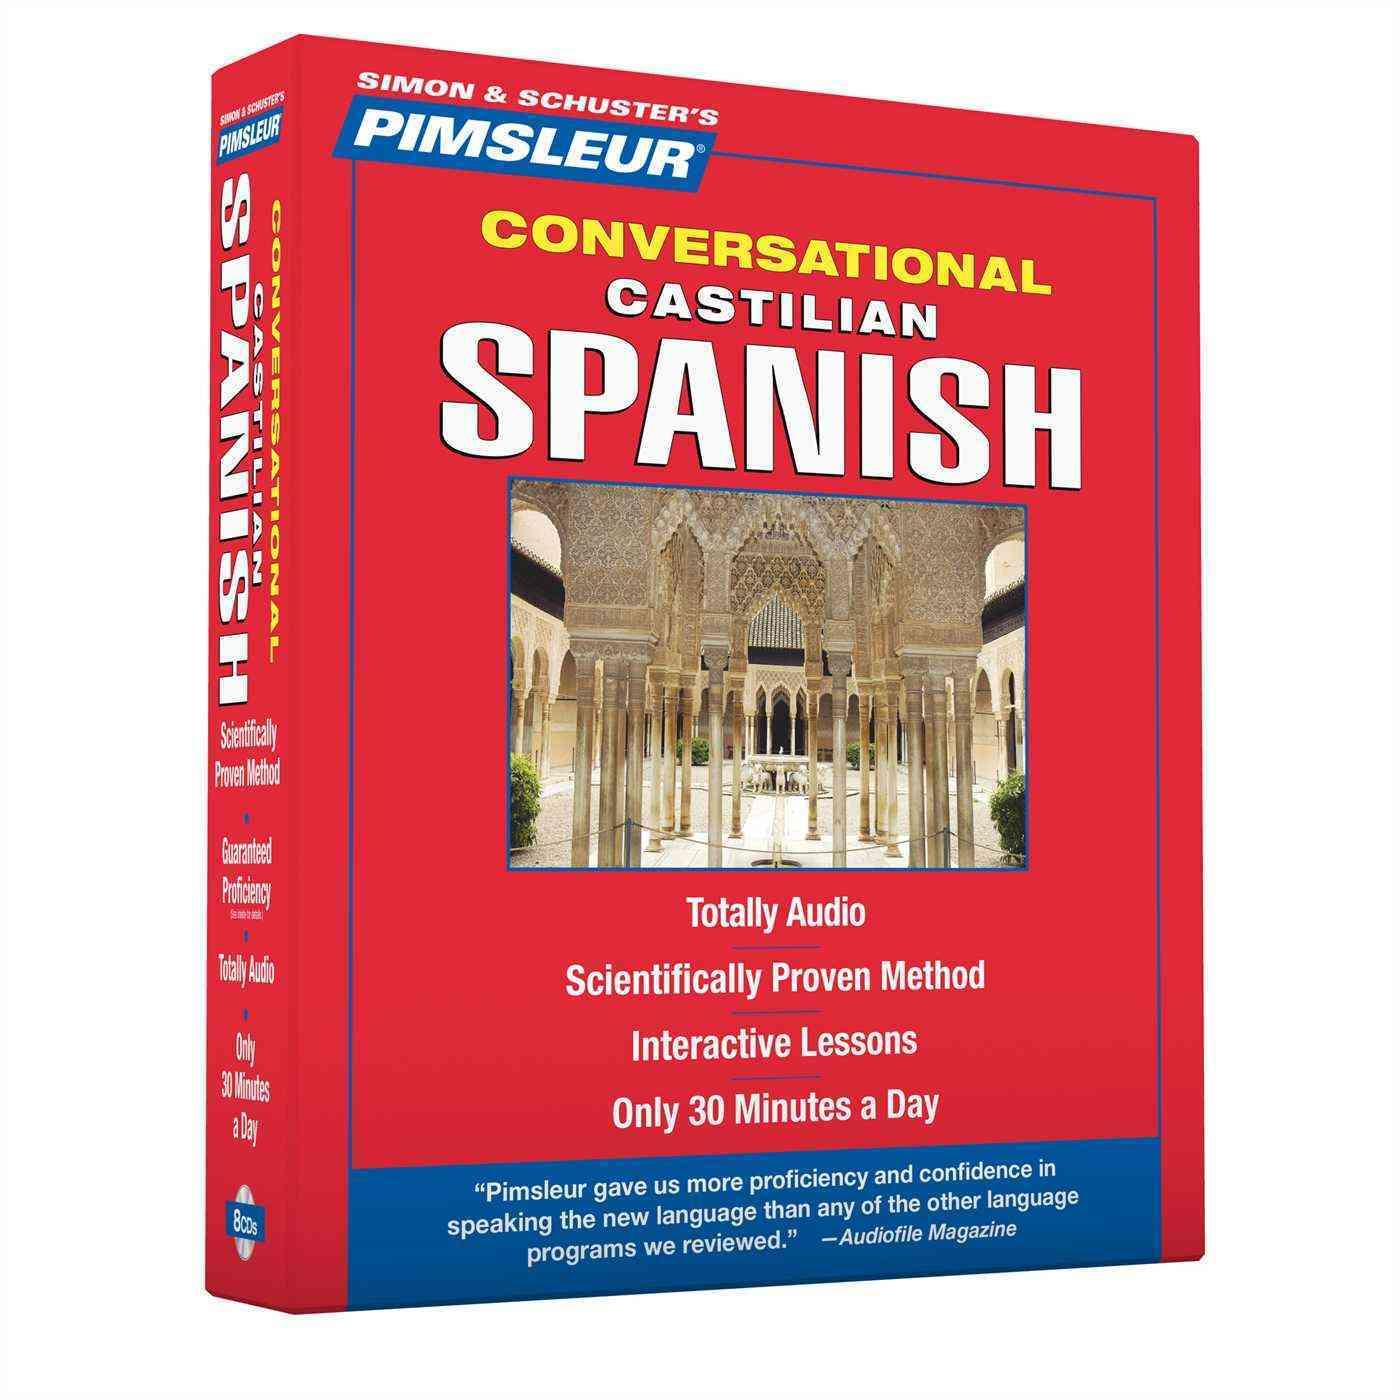 Pimsleur Conversational Castilian Spanish (CD-Audio)